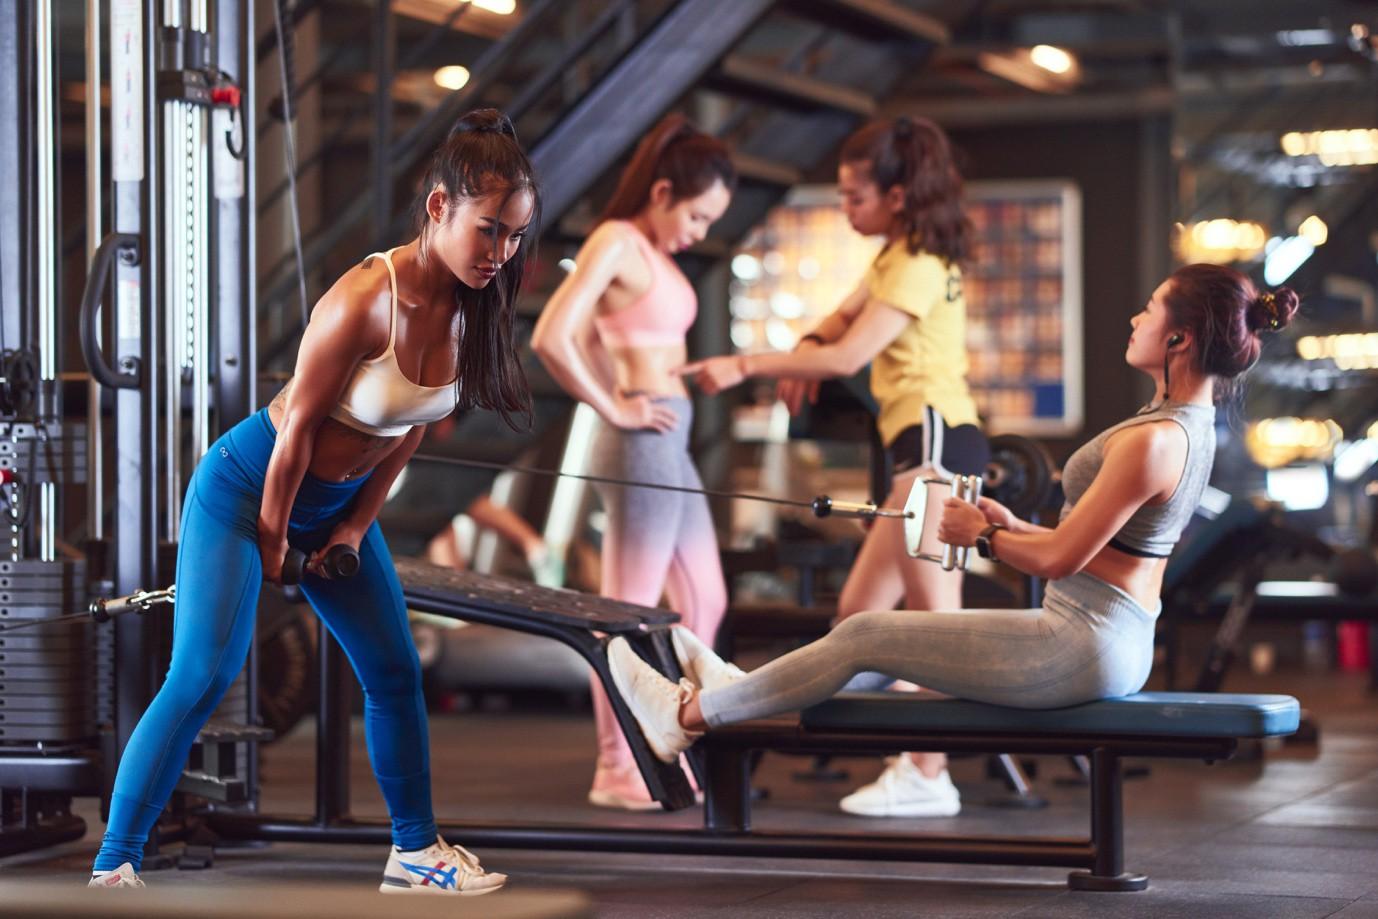 Ảnh nữ tập gym